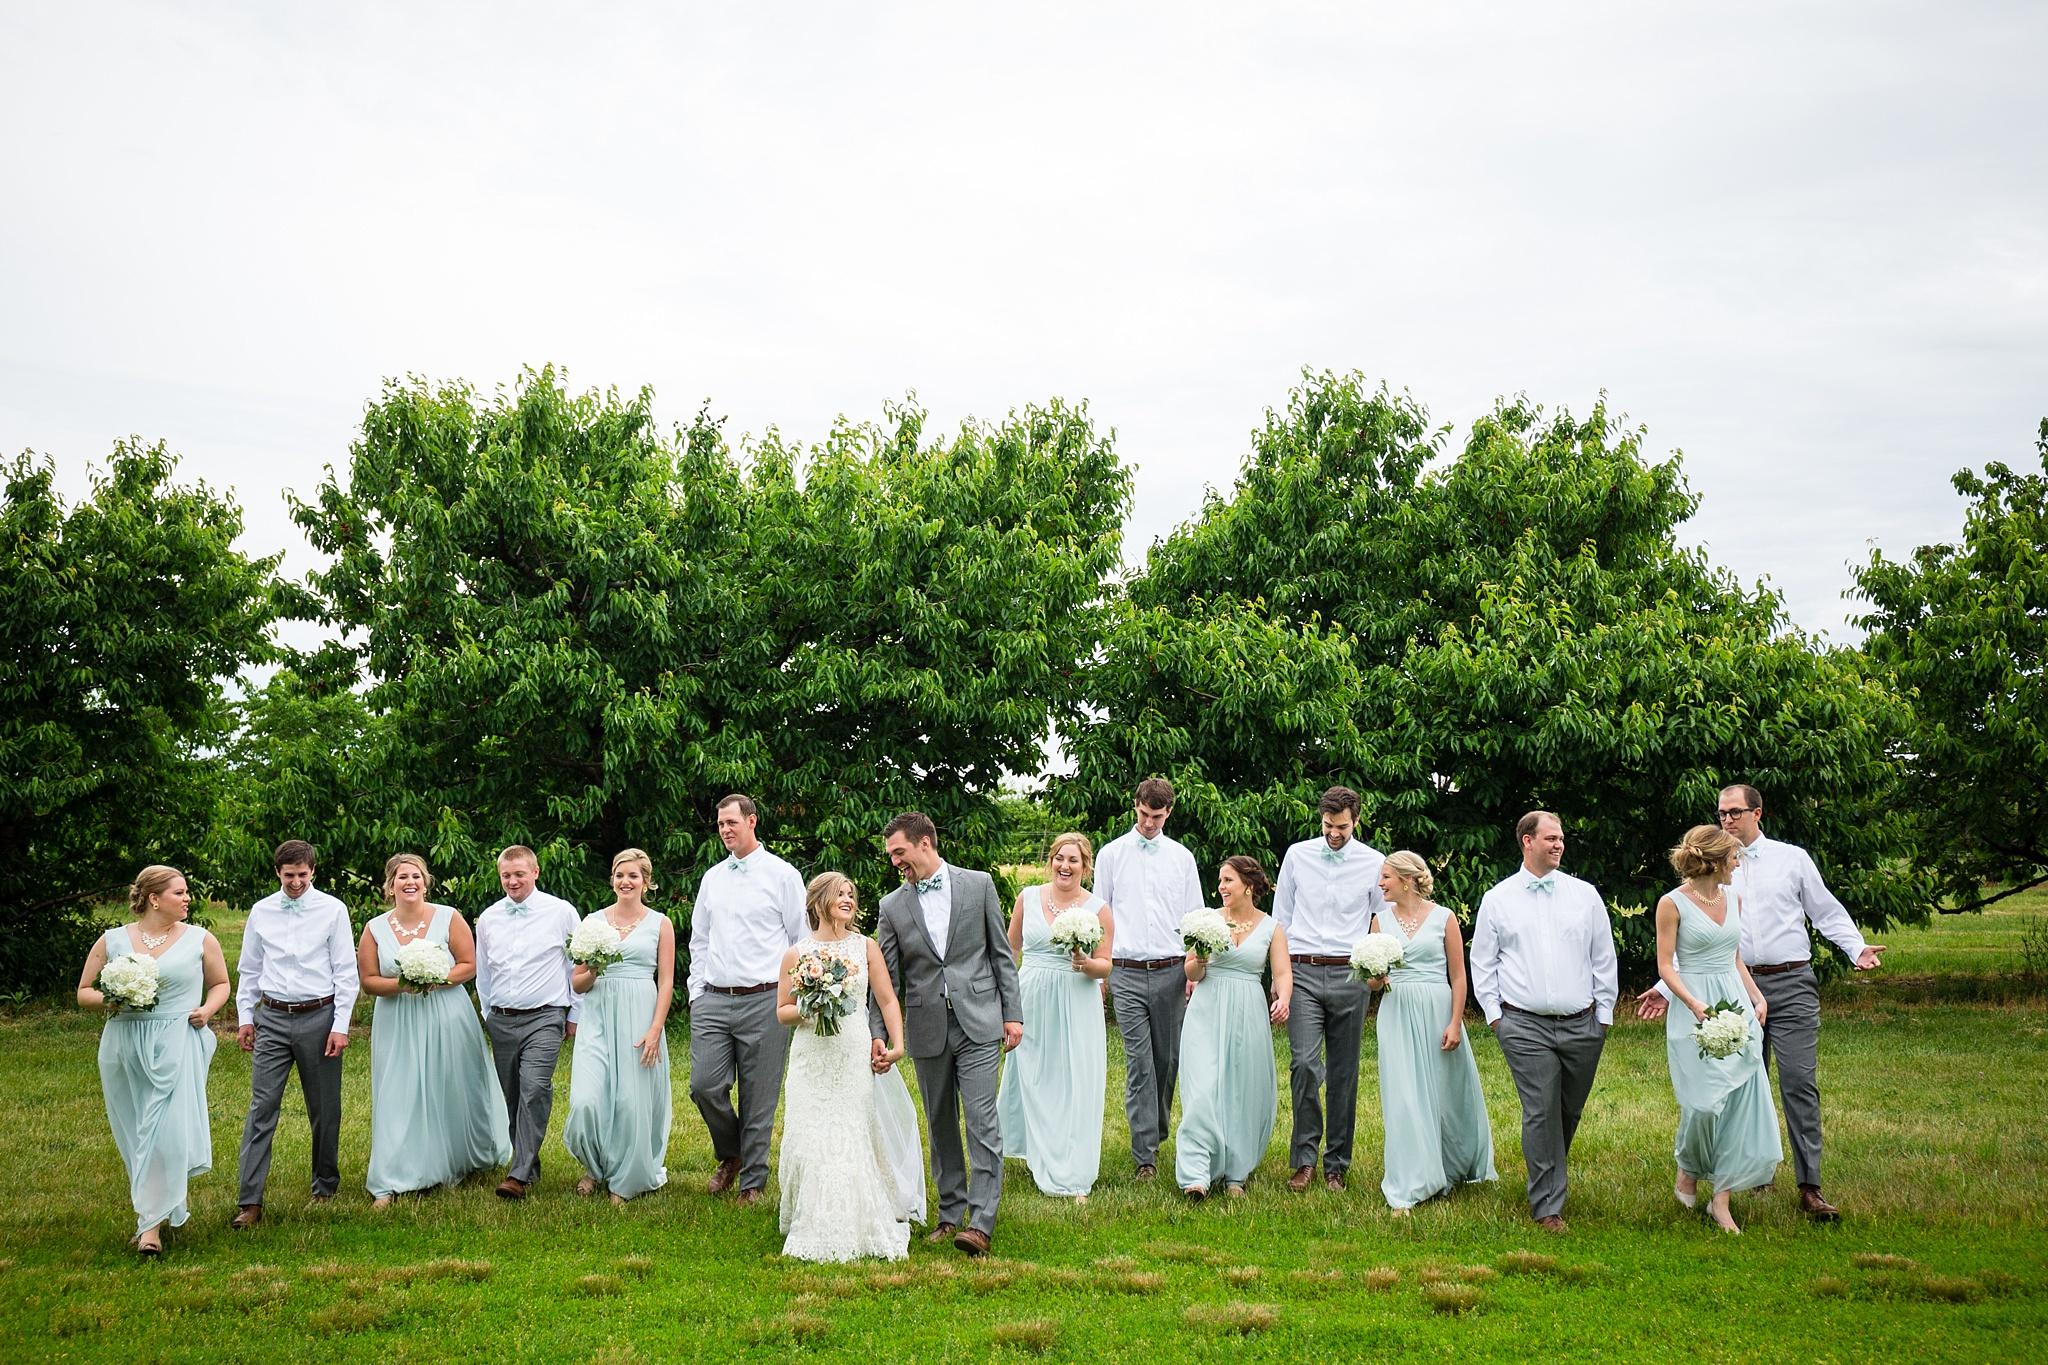 Mandi_Jack_Treehouse_Grand_Rapids_Wedding_0035.jpg